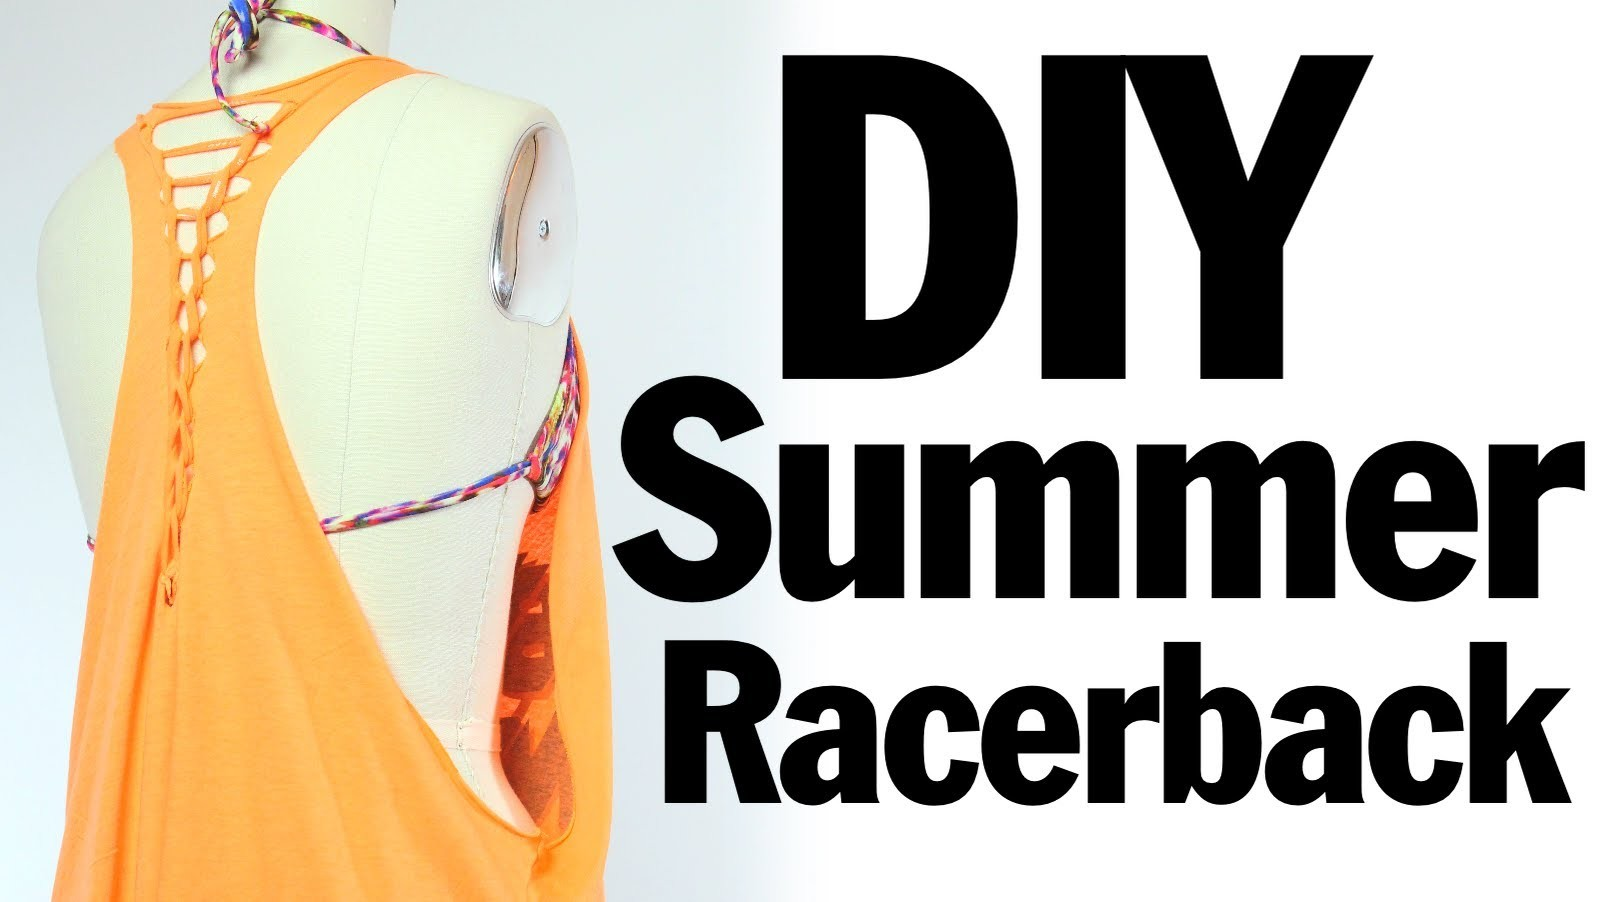 DIY Racerback Muscle T-shirt Recon, Summer Music Festival Fashion